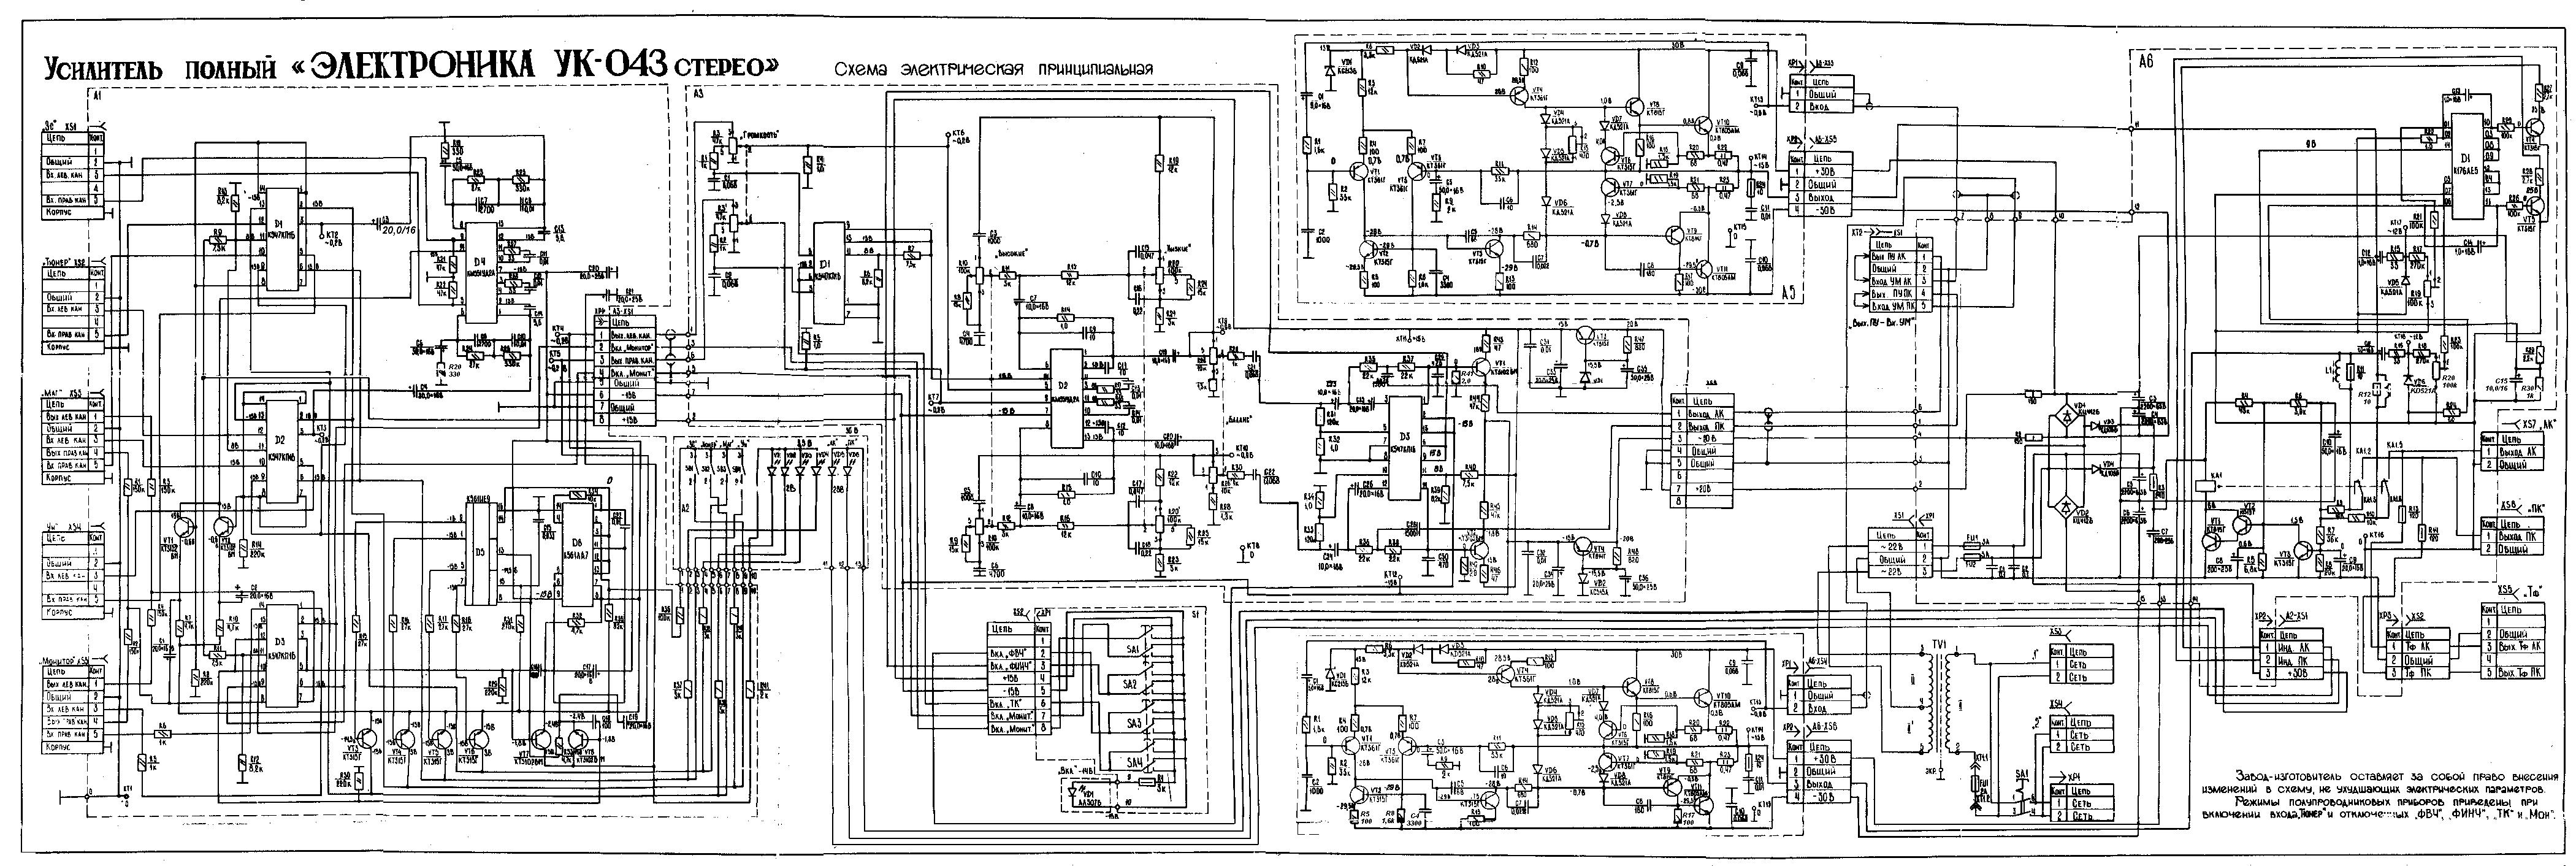 Электроника э 043 схема фото 817